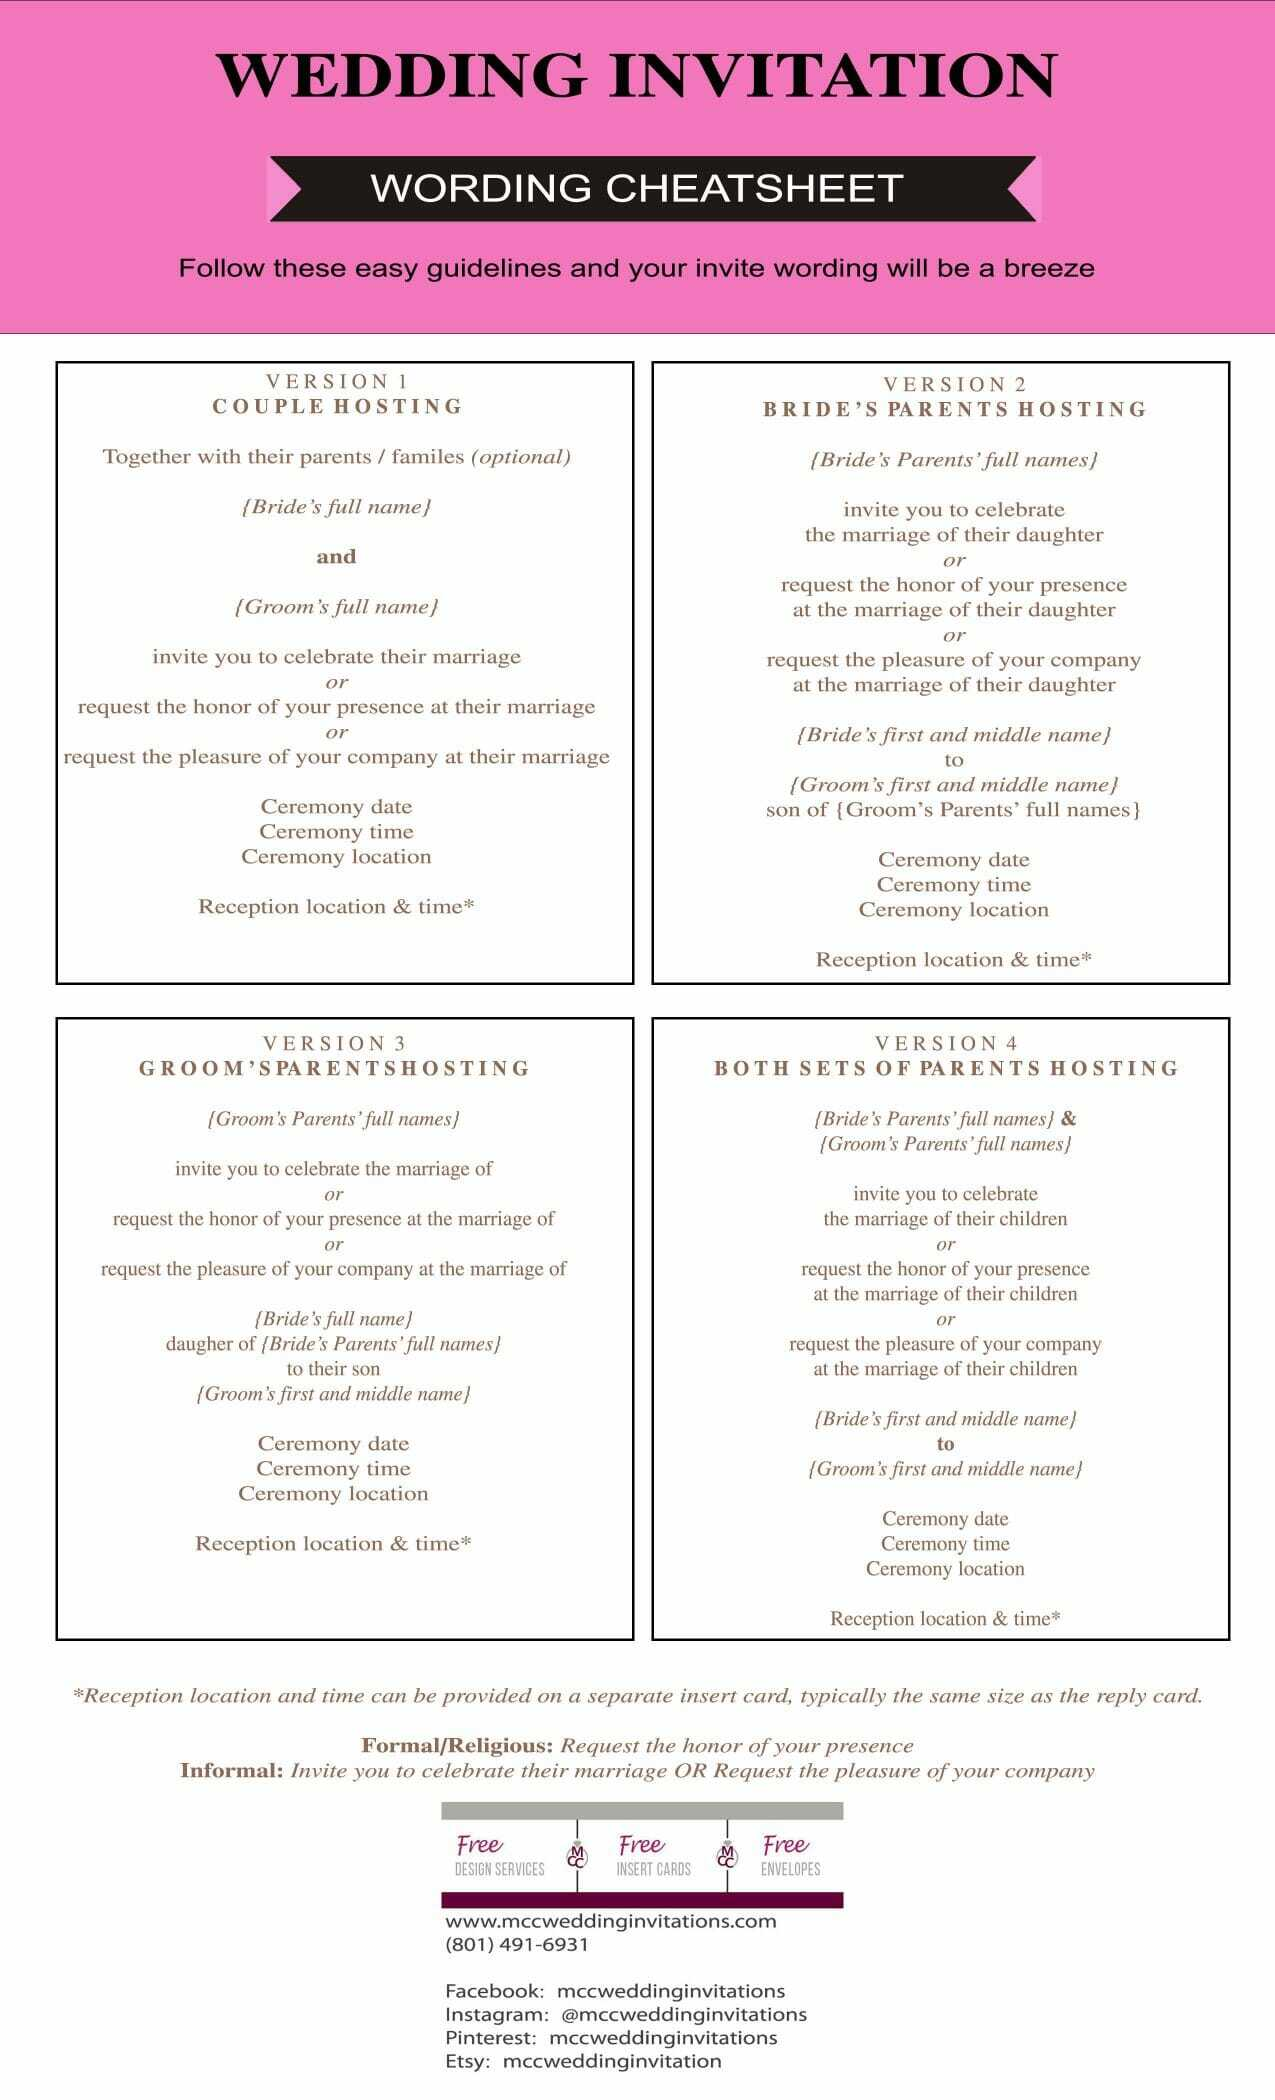 Wedding Invitation Etiquette Guide - MCC Wedding Invitations: We ...